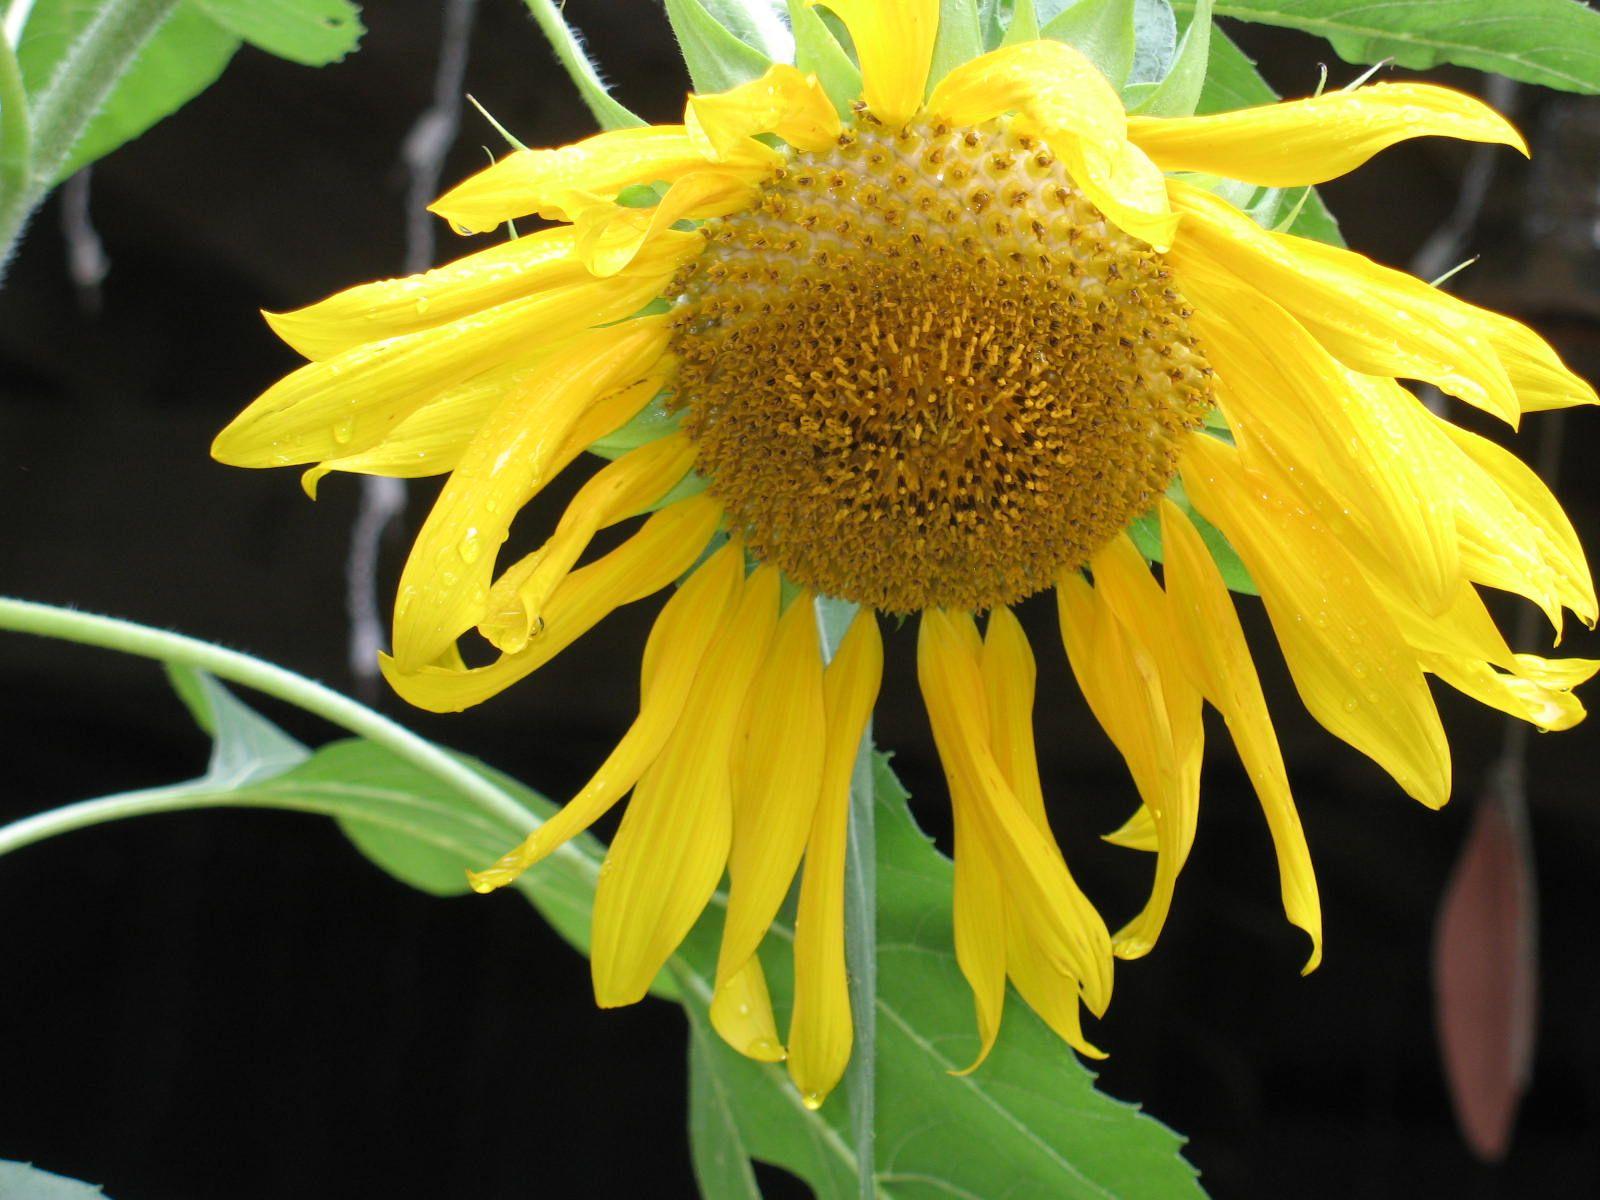 My sunflower has gone sad on me.